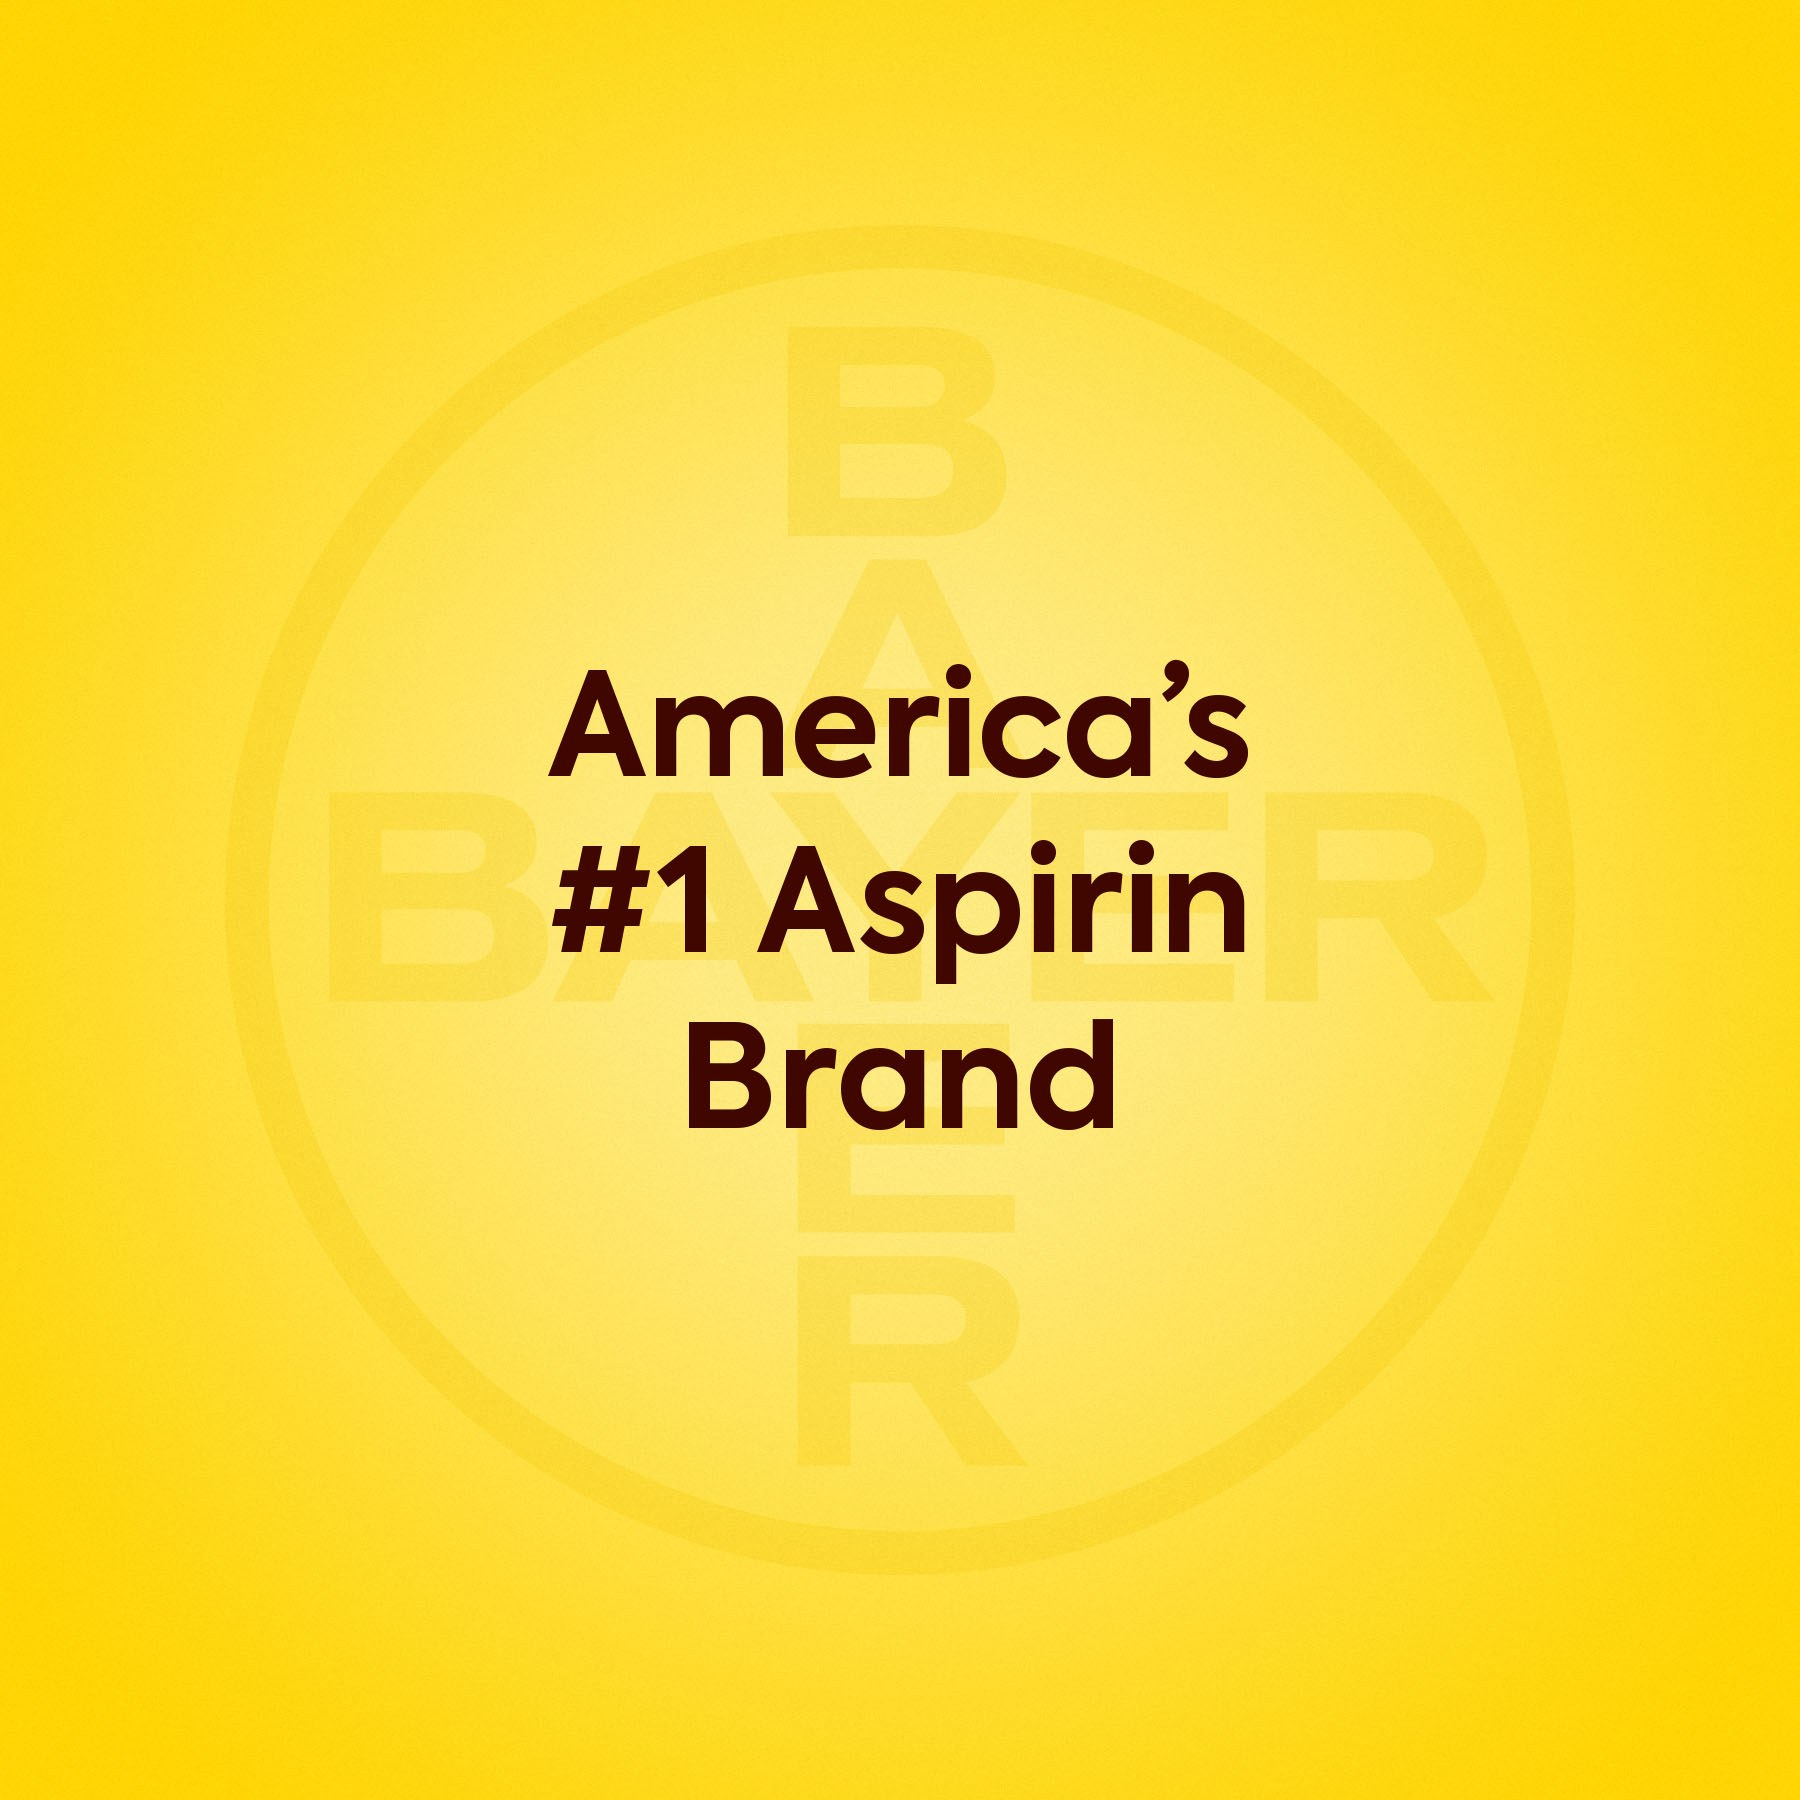 America's #1 Aspirin Brand